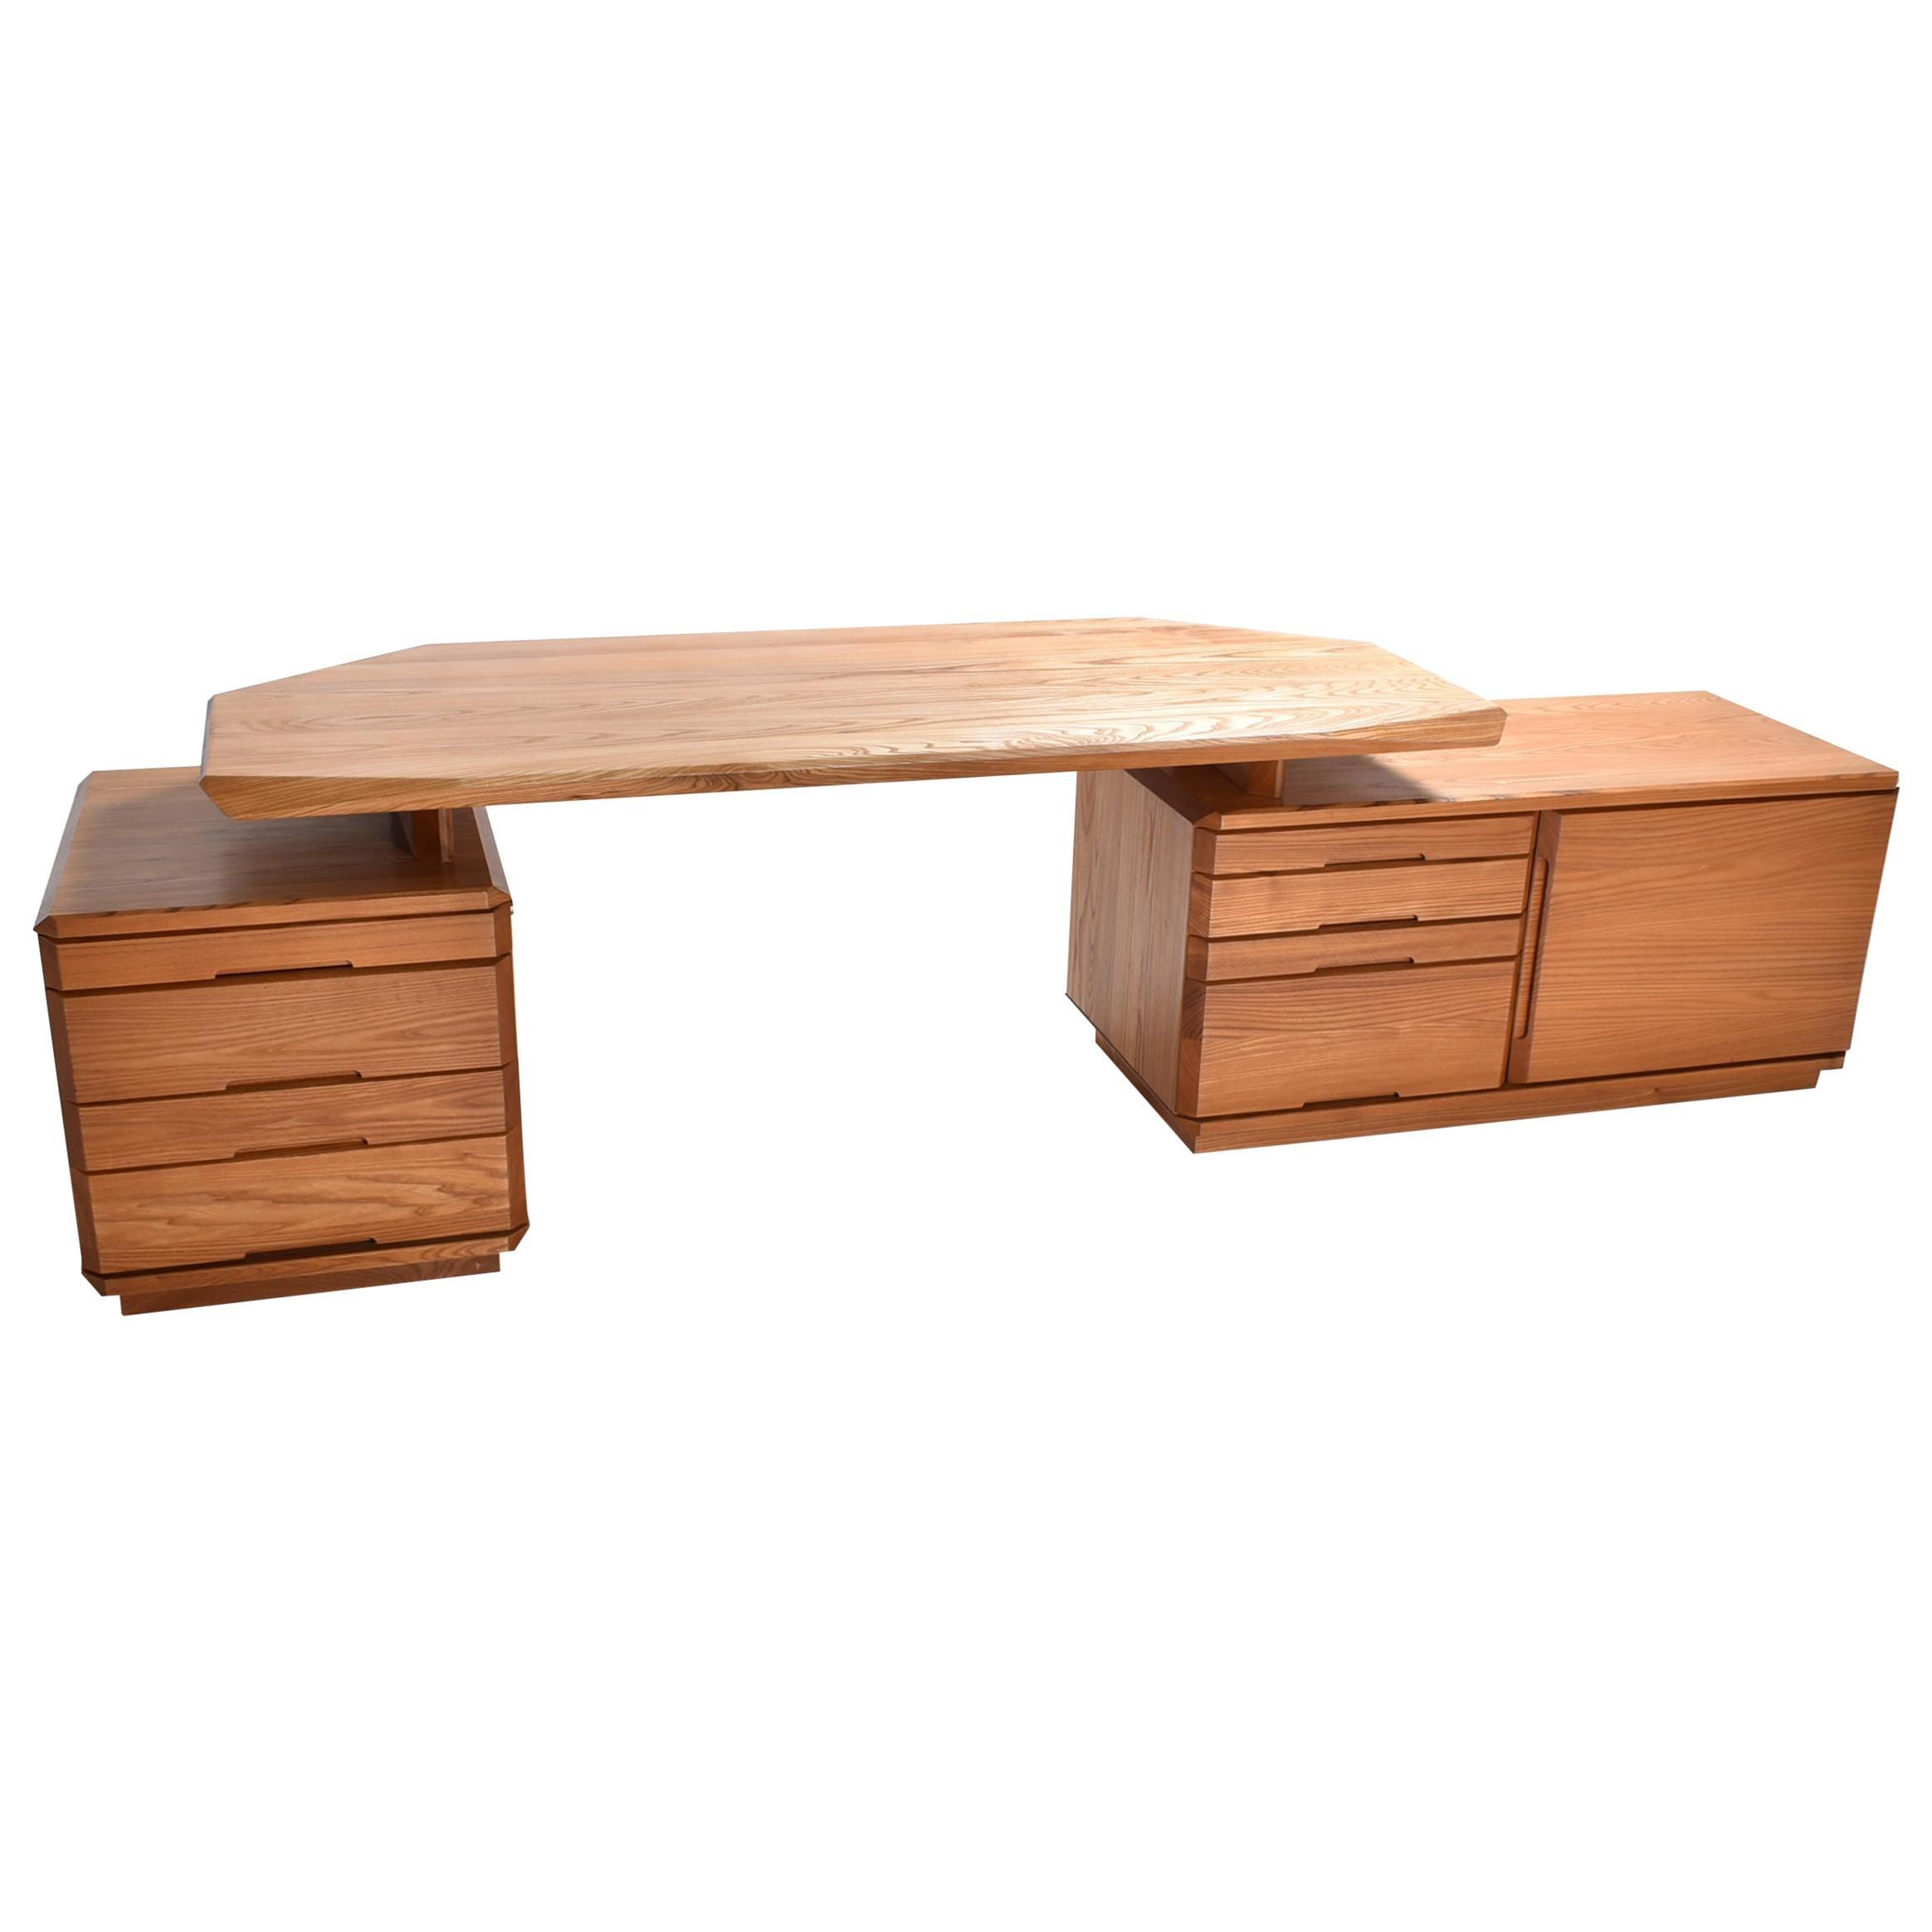 Mid-Century Modern Solid Elm Desk B 40 by Pierre Chapo, France, 1980